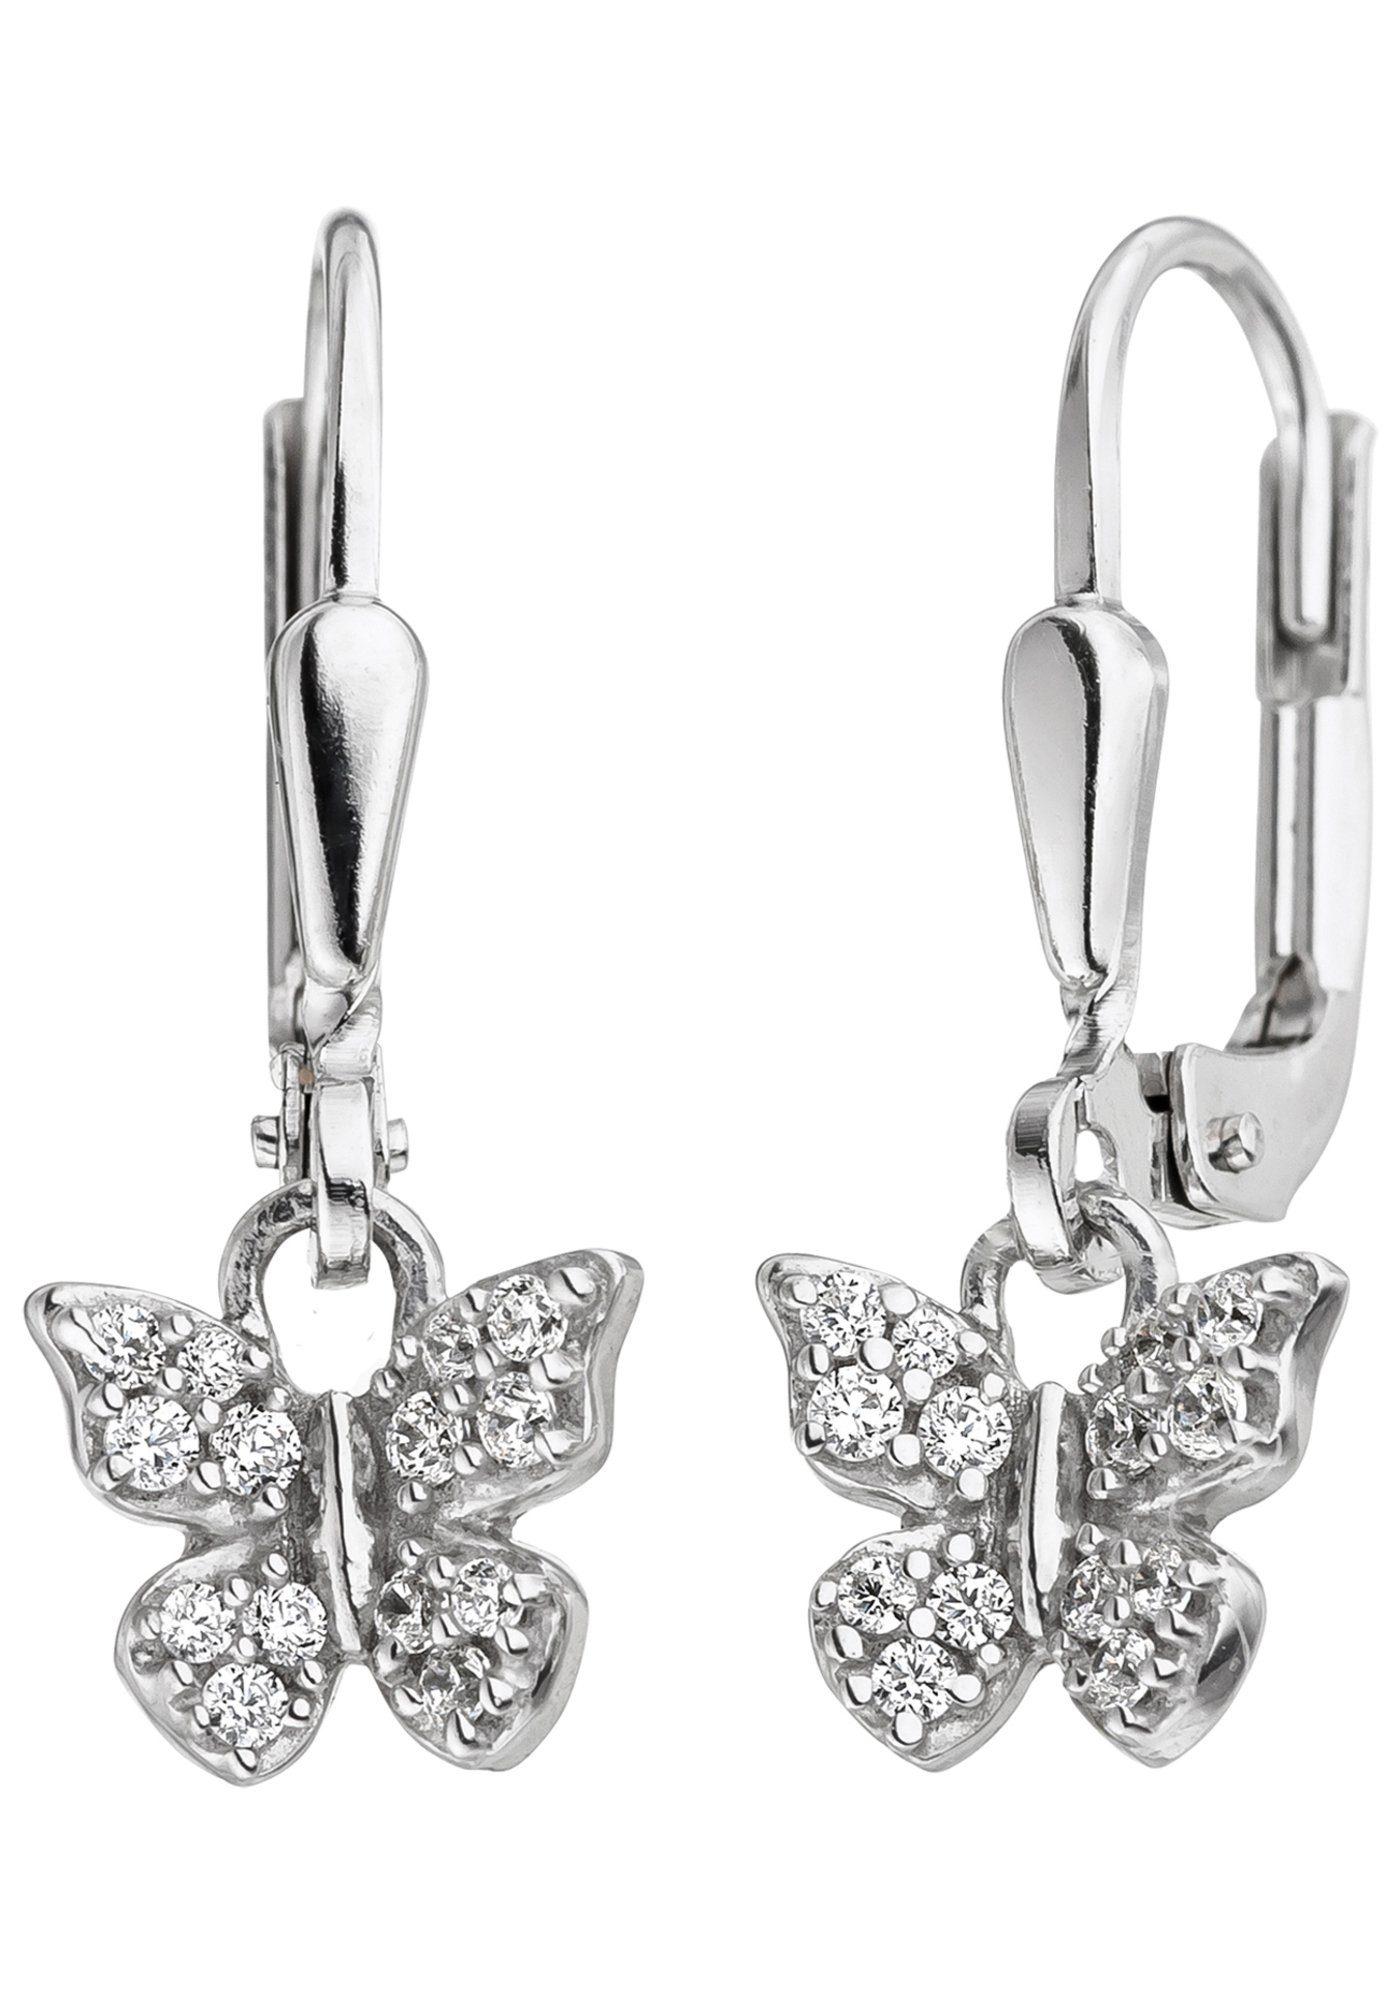 JOBO Paar Ohrhänger »Schmetterling« 925 Silber mit Zirkonia